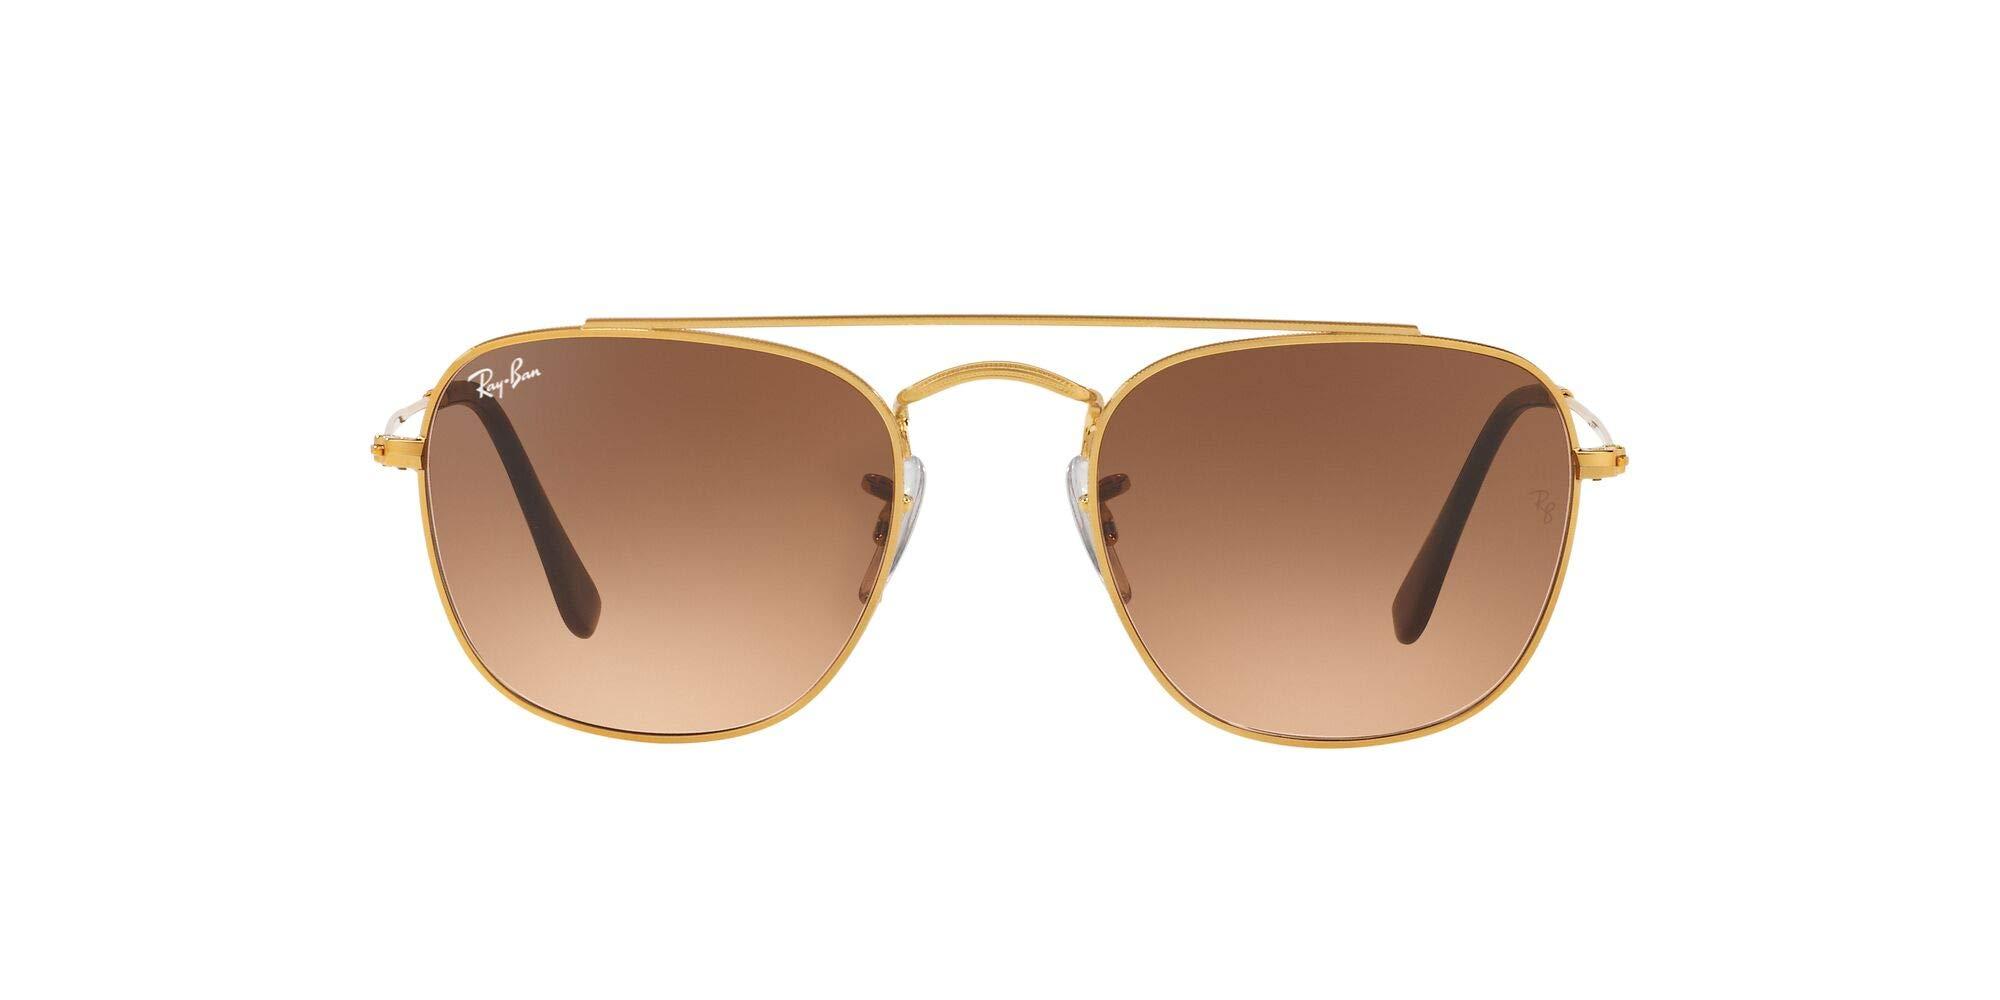 Ray-Ban Men's RB3557 Square Metal Sunglasses